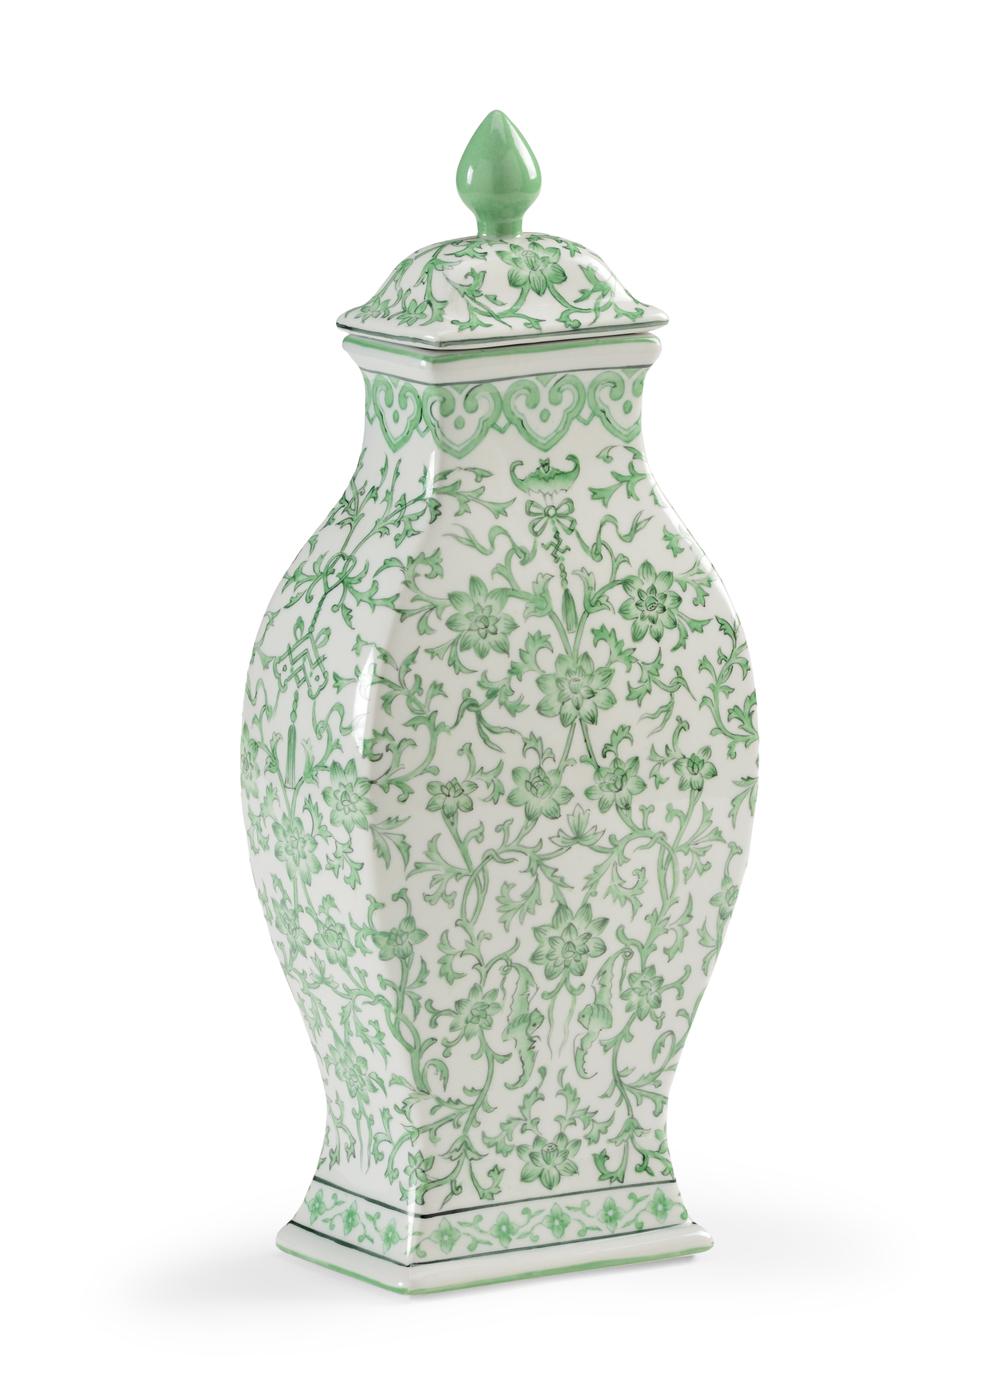 Chelsea House - Green Covered Urn